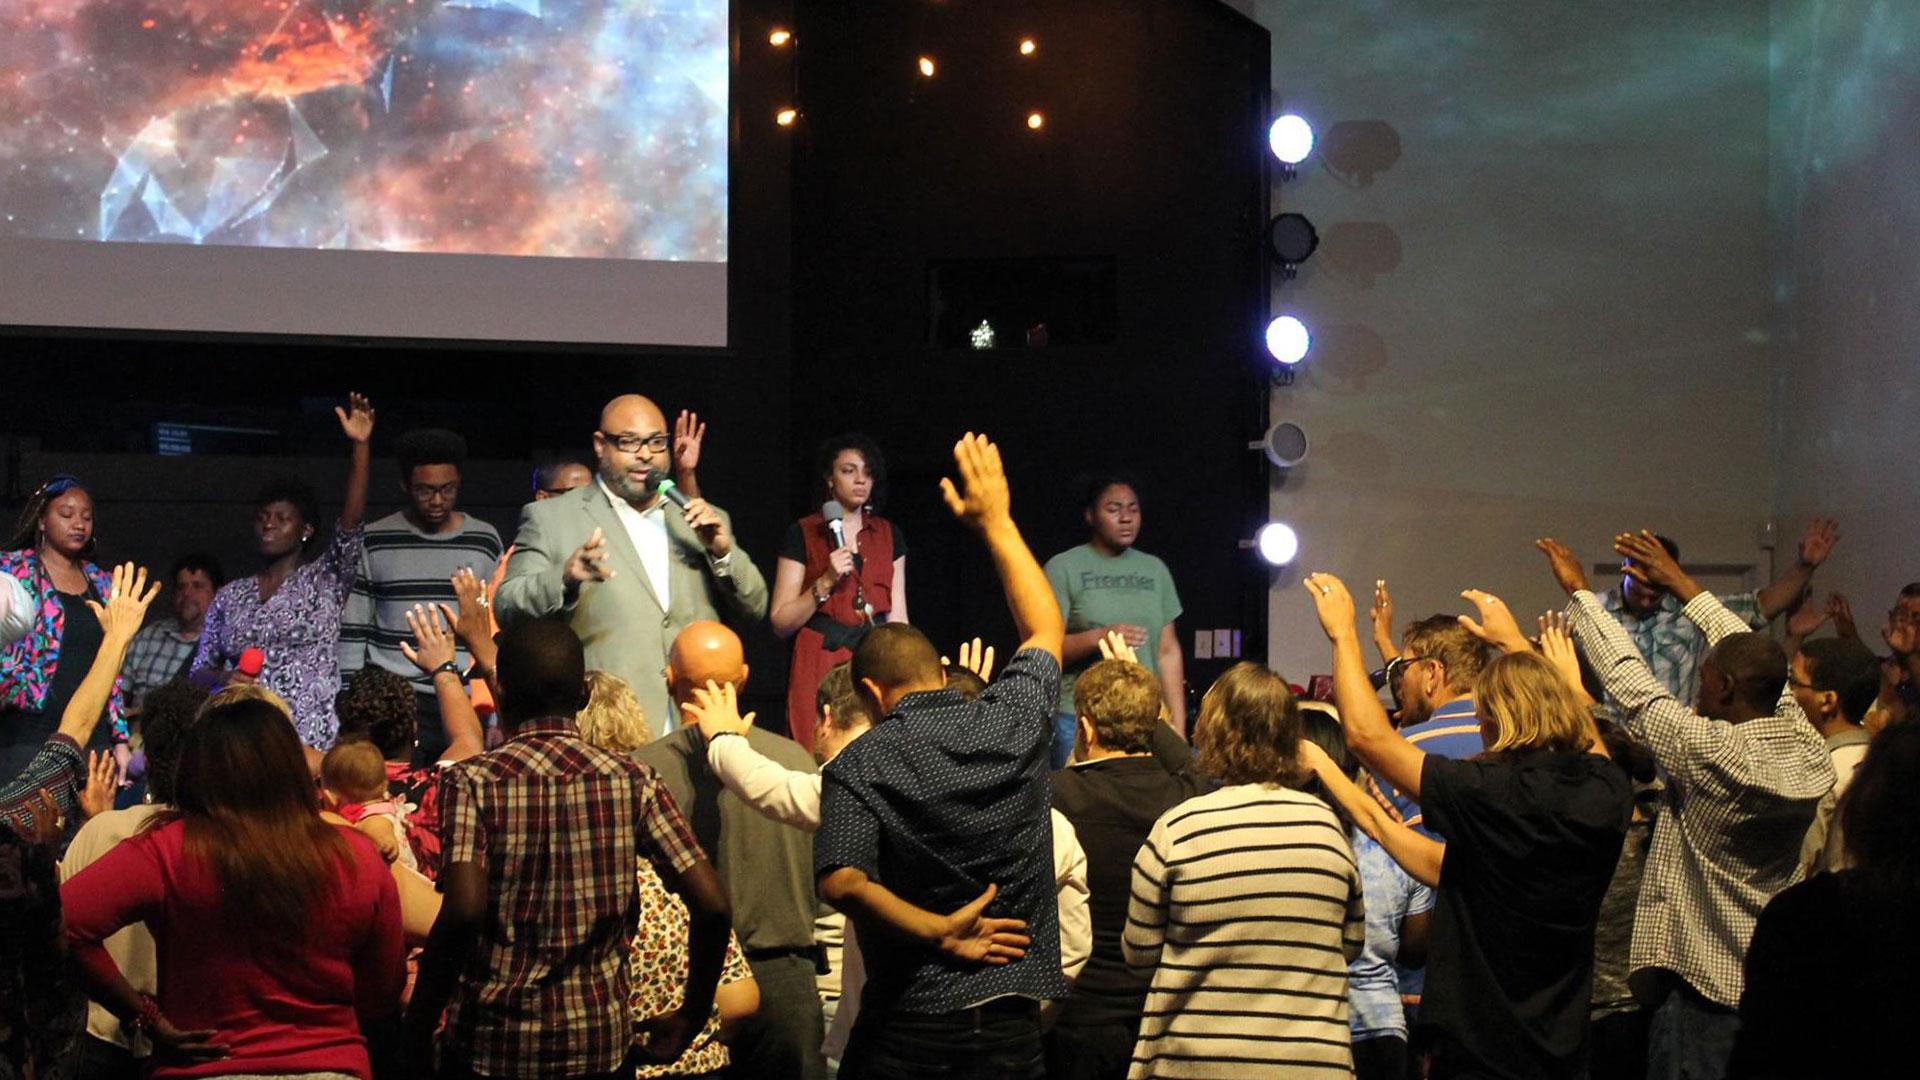 Worship at Frontier Church